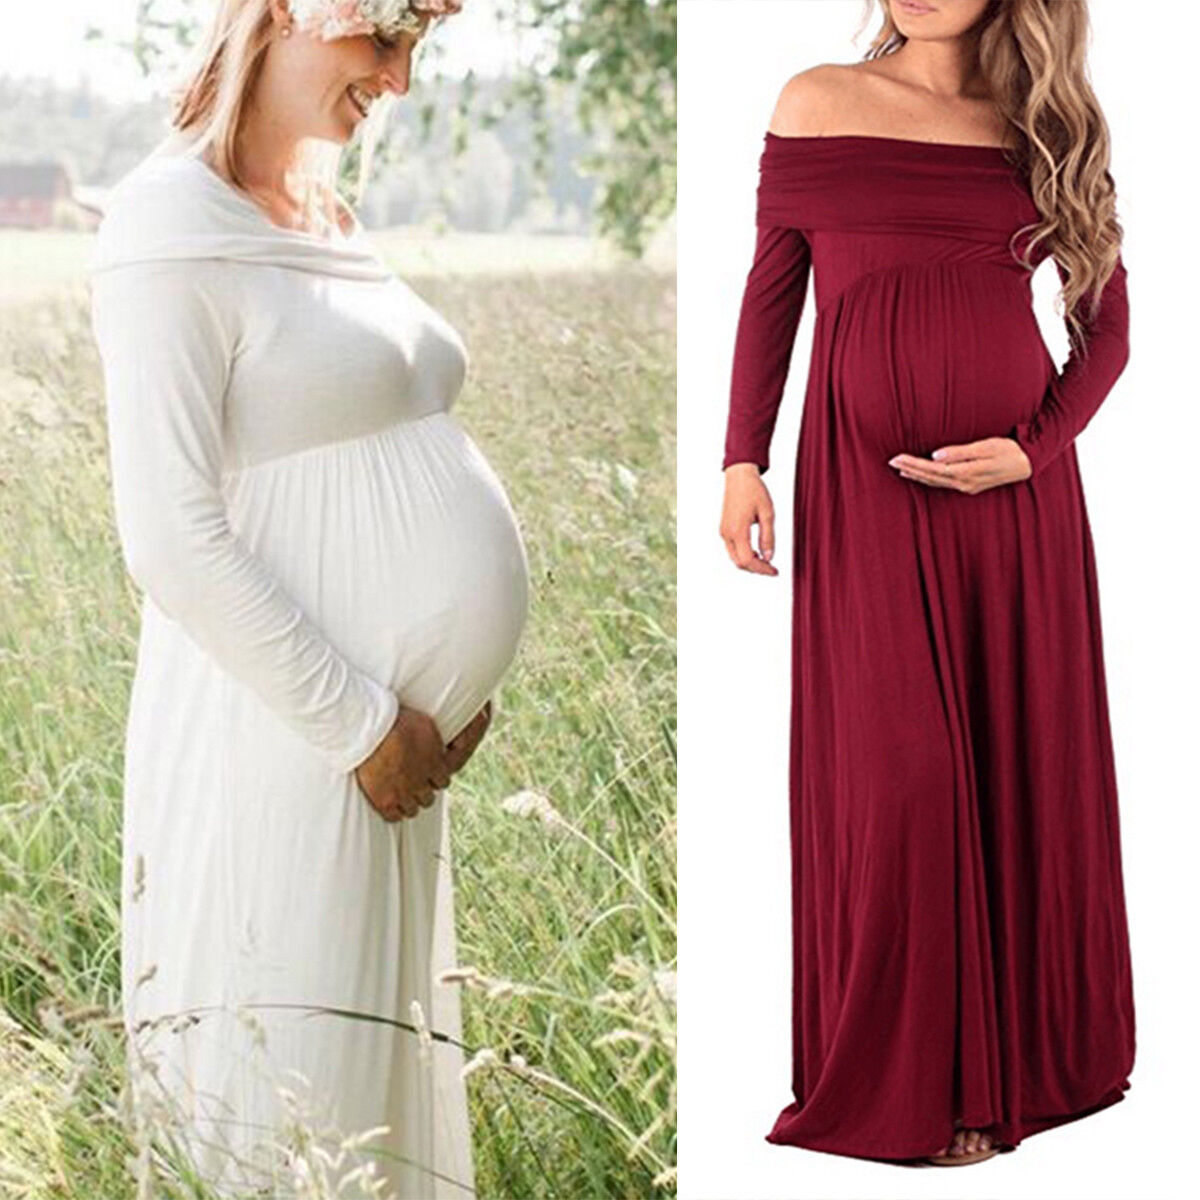 Women\'s Maternity Off Shoulder Dress Pregnant Ladies Long Sleeve ...